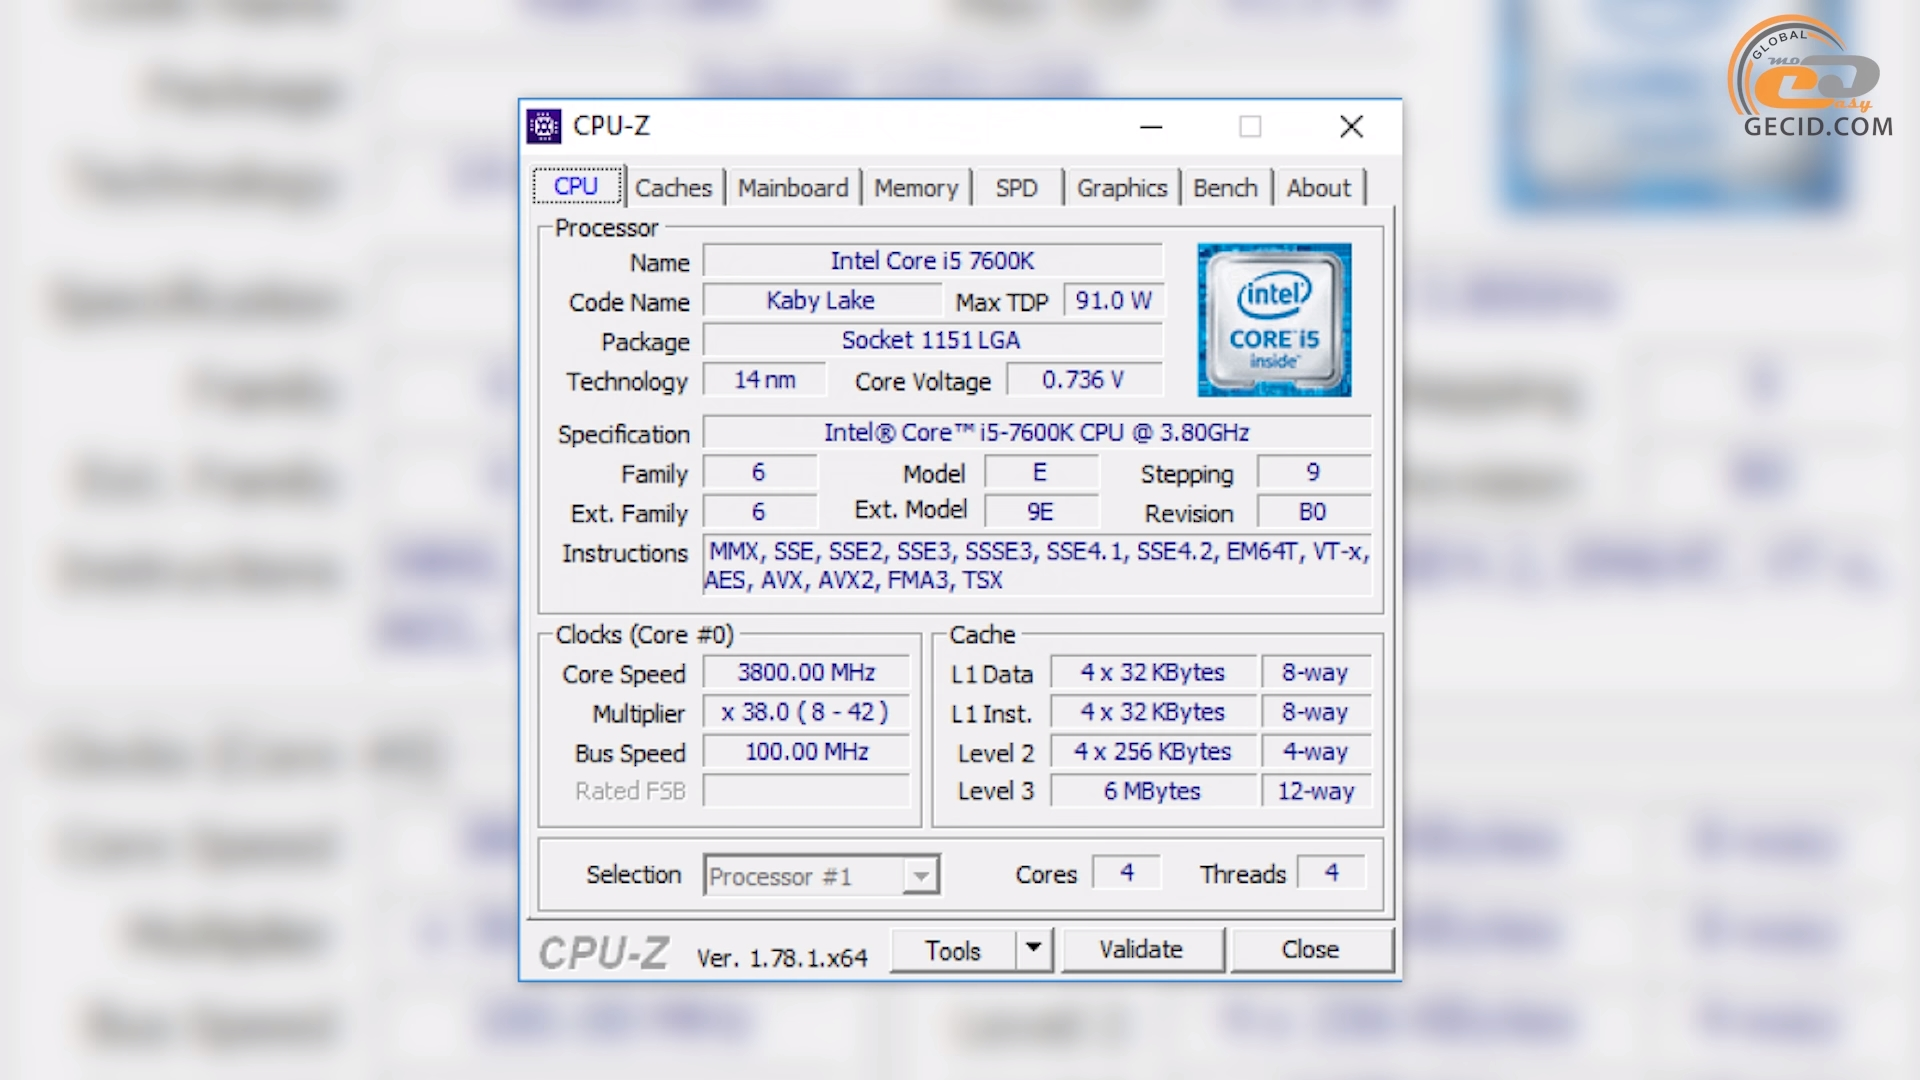 cpu-z i5-7600k